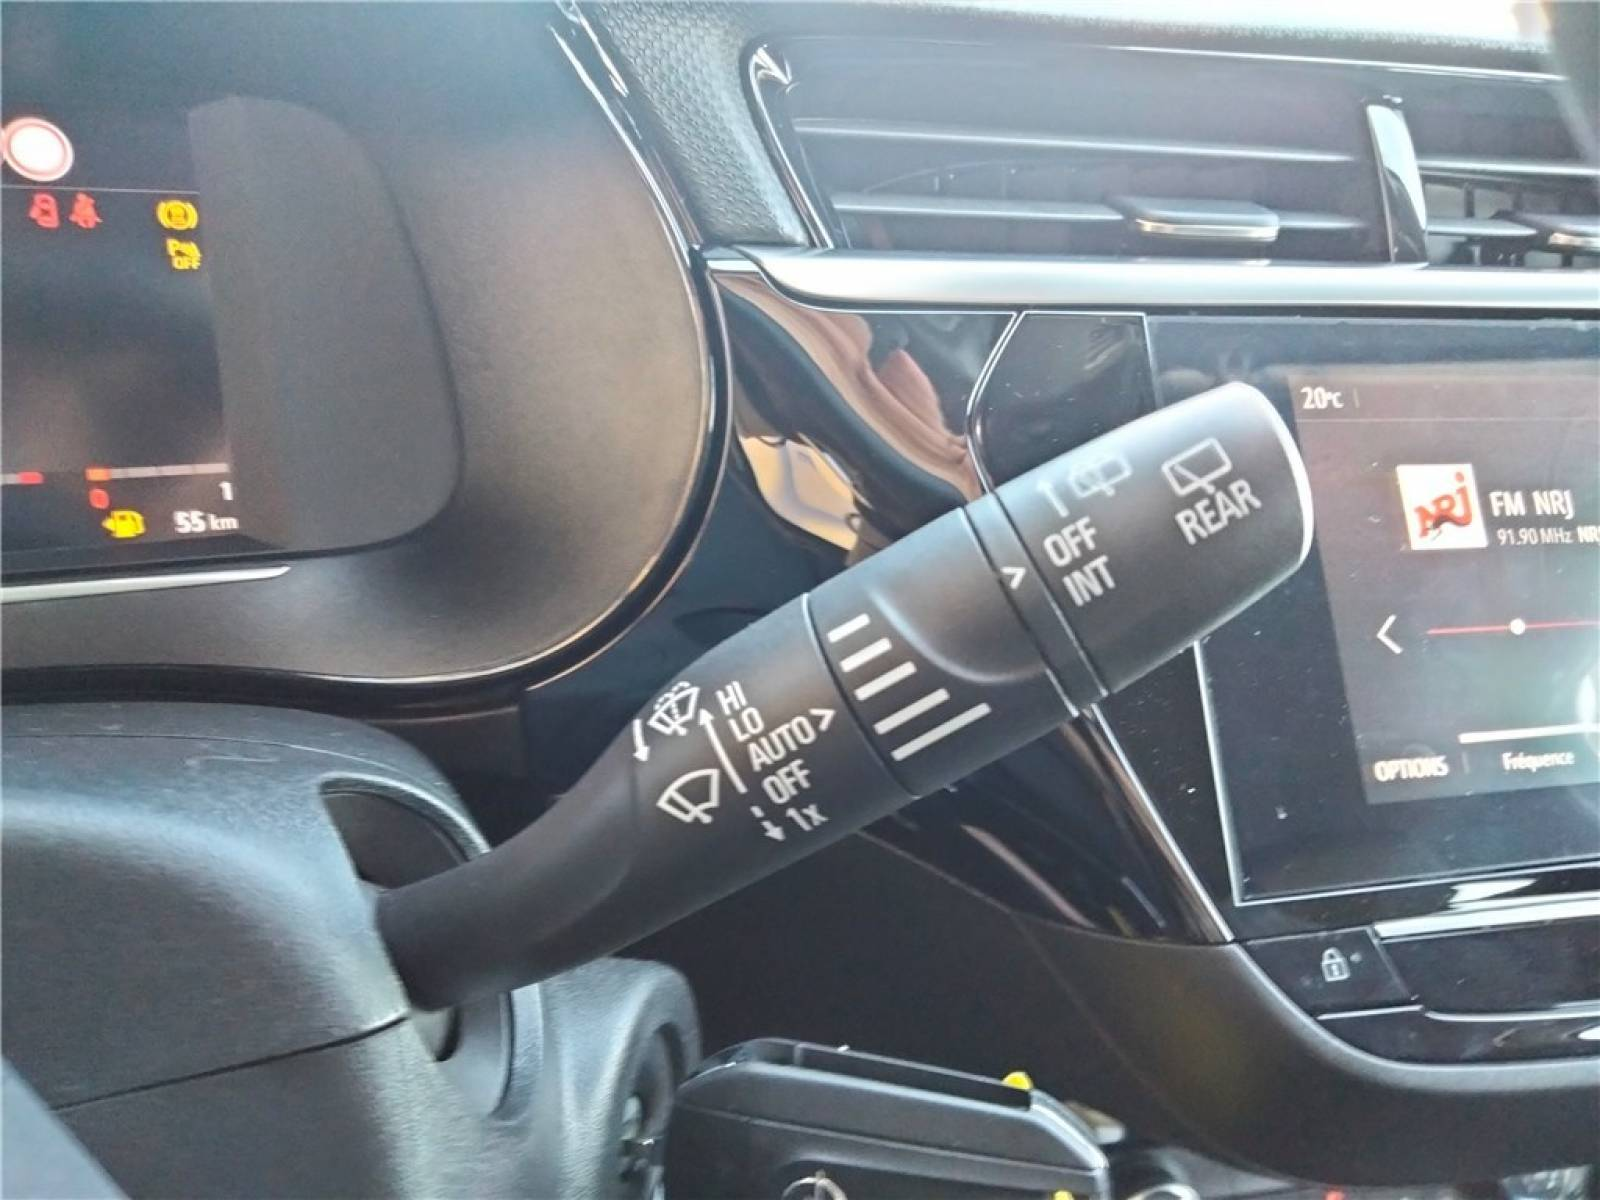 OPEL Corsa 1.2 Turbo 100 ch BVM6 - véhicule d'occasion - Groupe Guillet - Opel Magicauto - Chalon-sur-Saône - 71380 - Saint-Marcel - 27